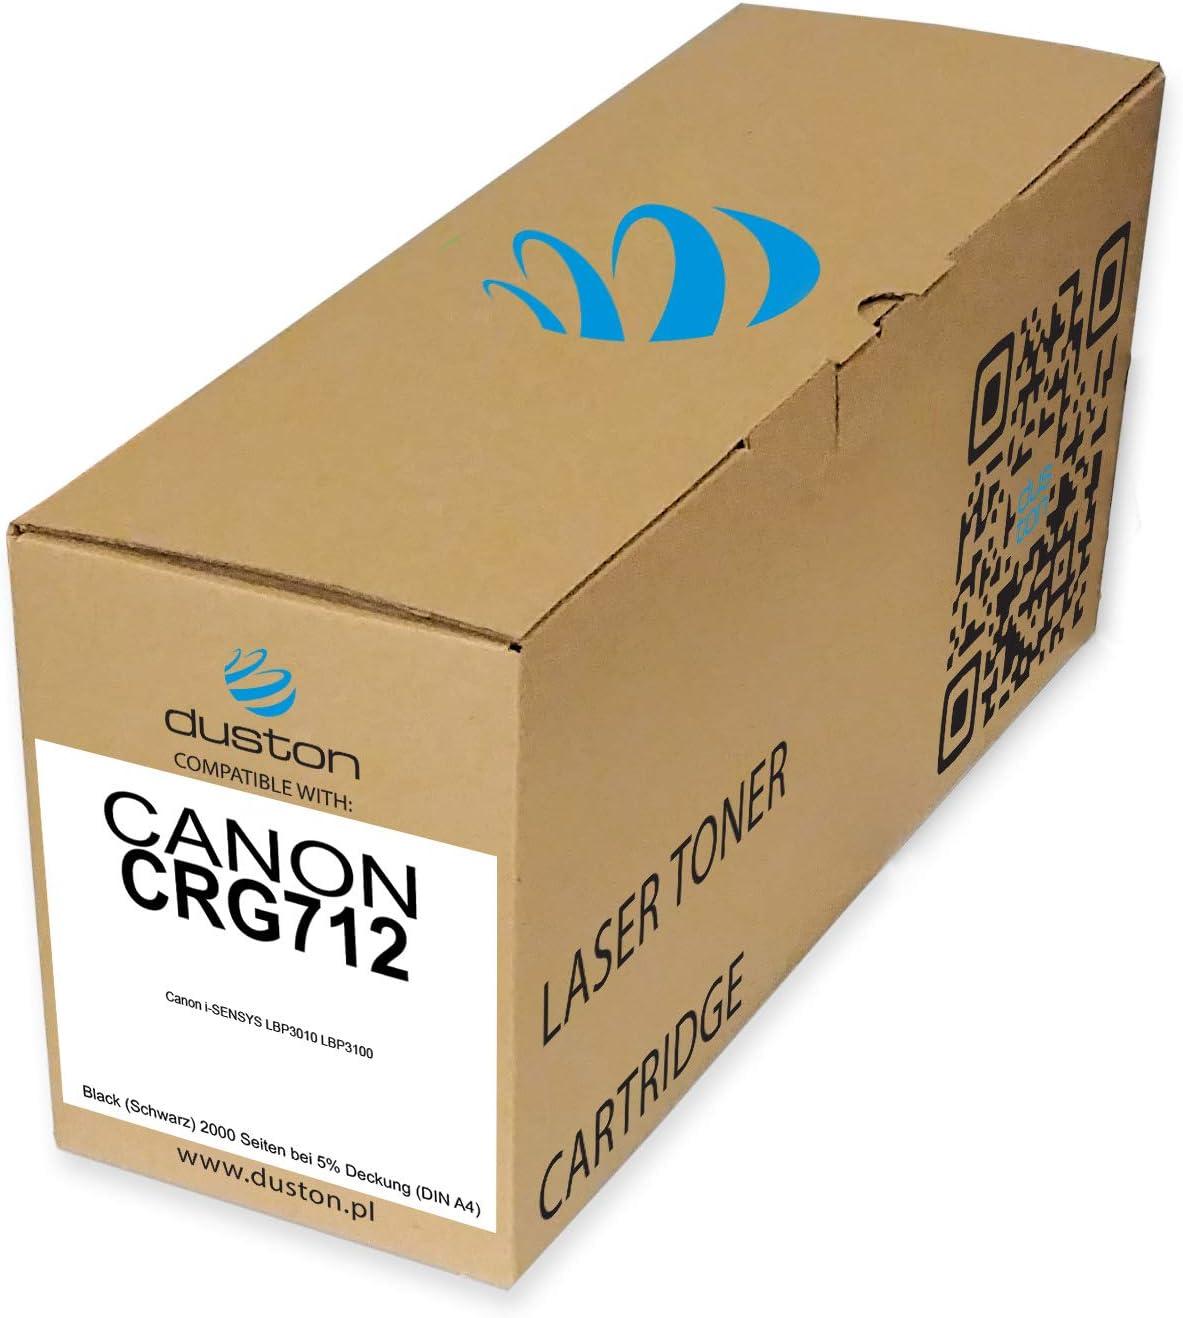 Crg712 1870b002aa Schwarz Duston Toner Kompatibel Zu Canon Lbp3100 Lbp3010 Lbp3018 Lbp3050 Bürobedarf Schreibwaren